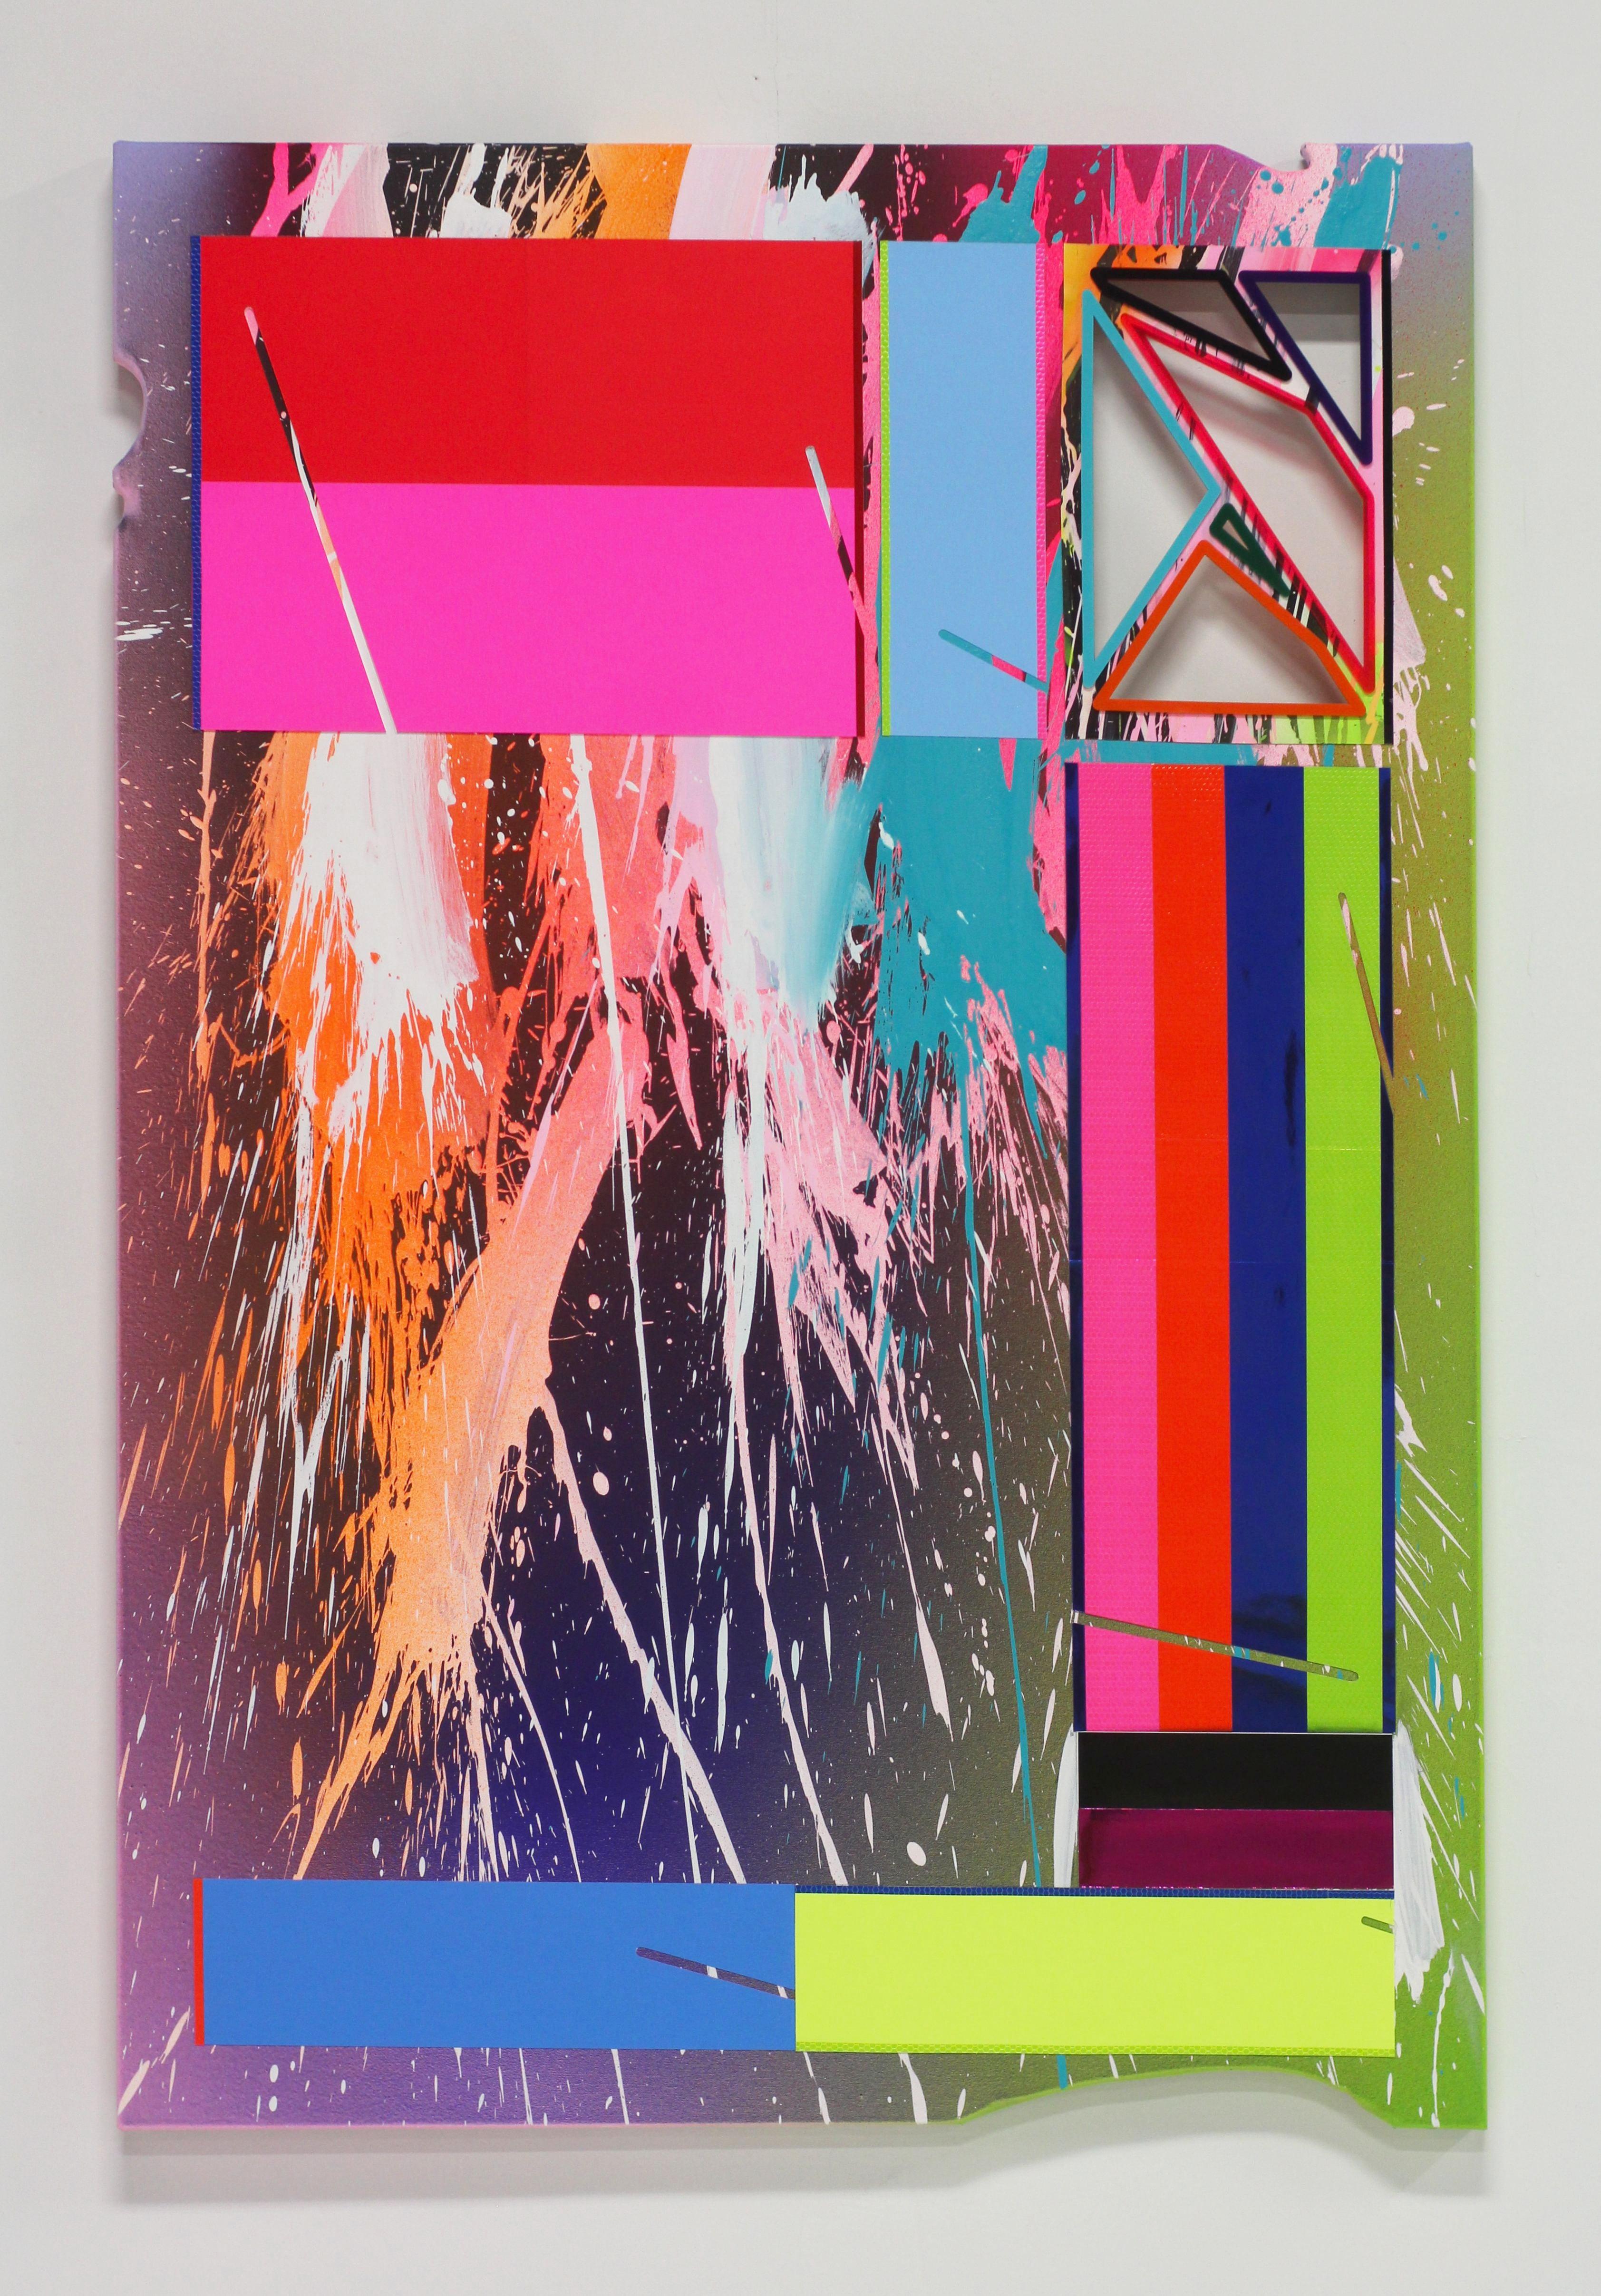 NemesM_Ghosting-Love-03-He_2019_132x91cm_acrylic-silkcsreened-paper-mirror-board-light-reflective-vinyl-lasercut-plexiglass-canvas-wood-min